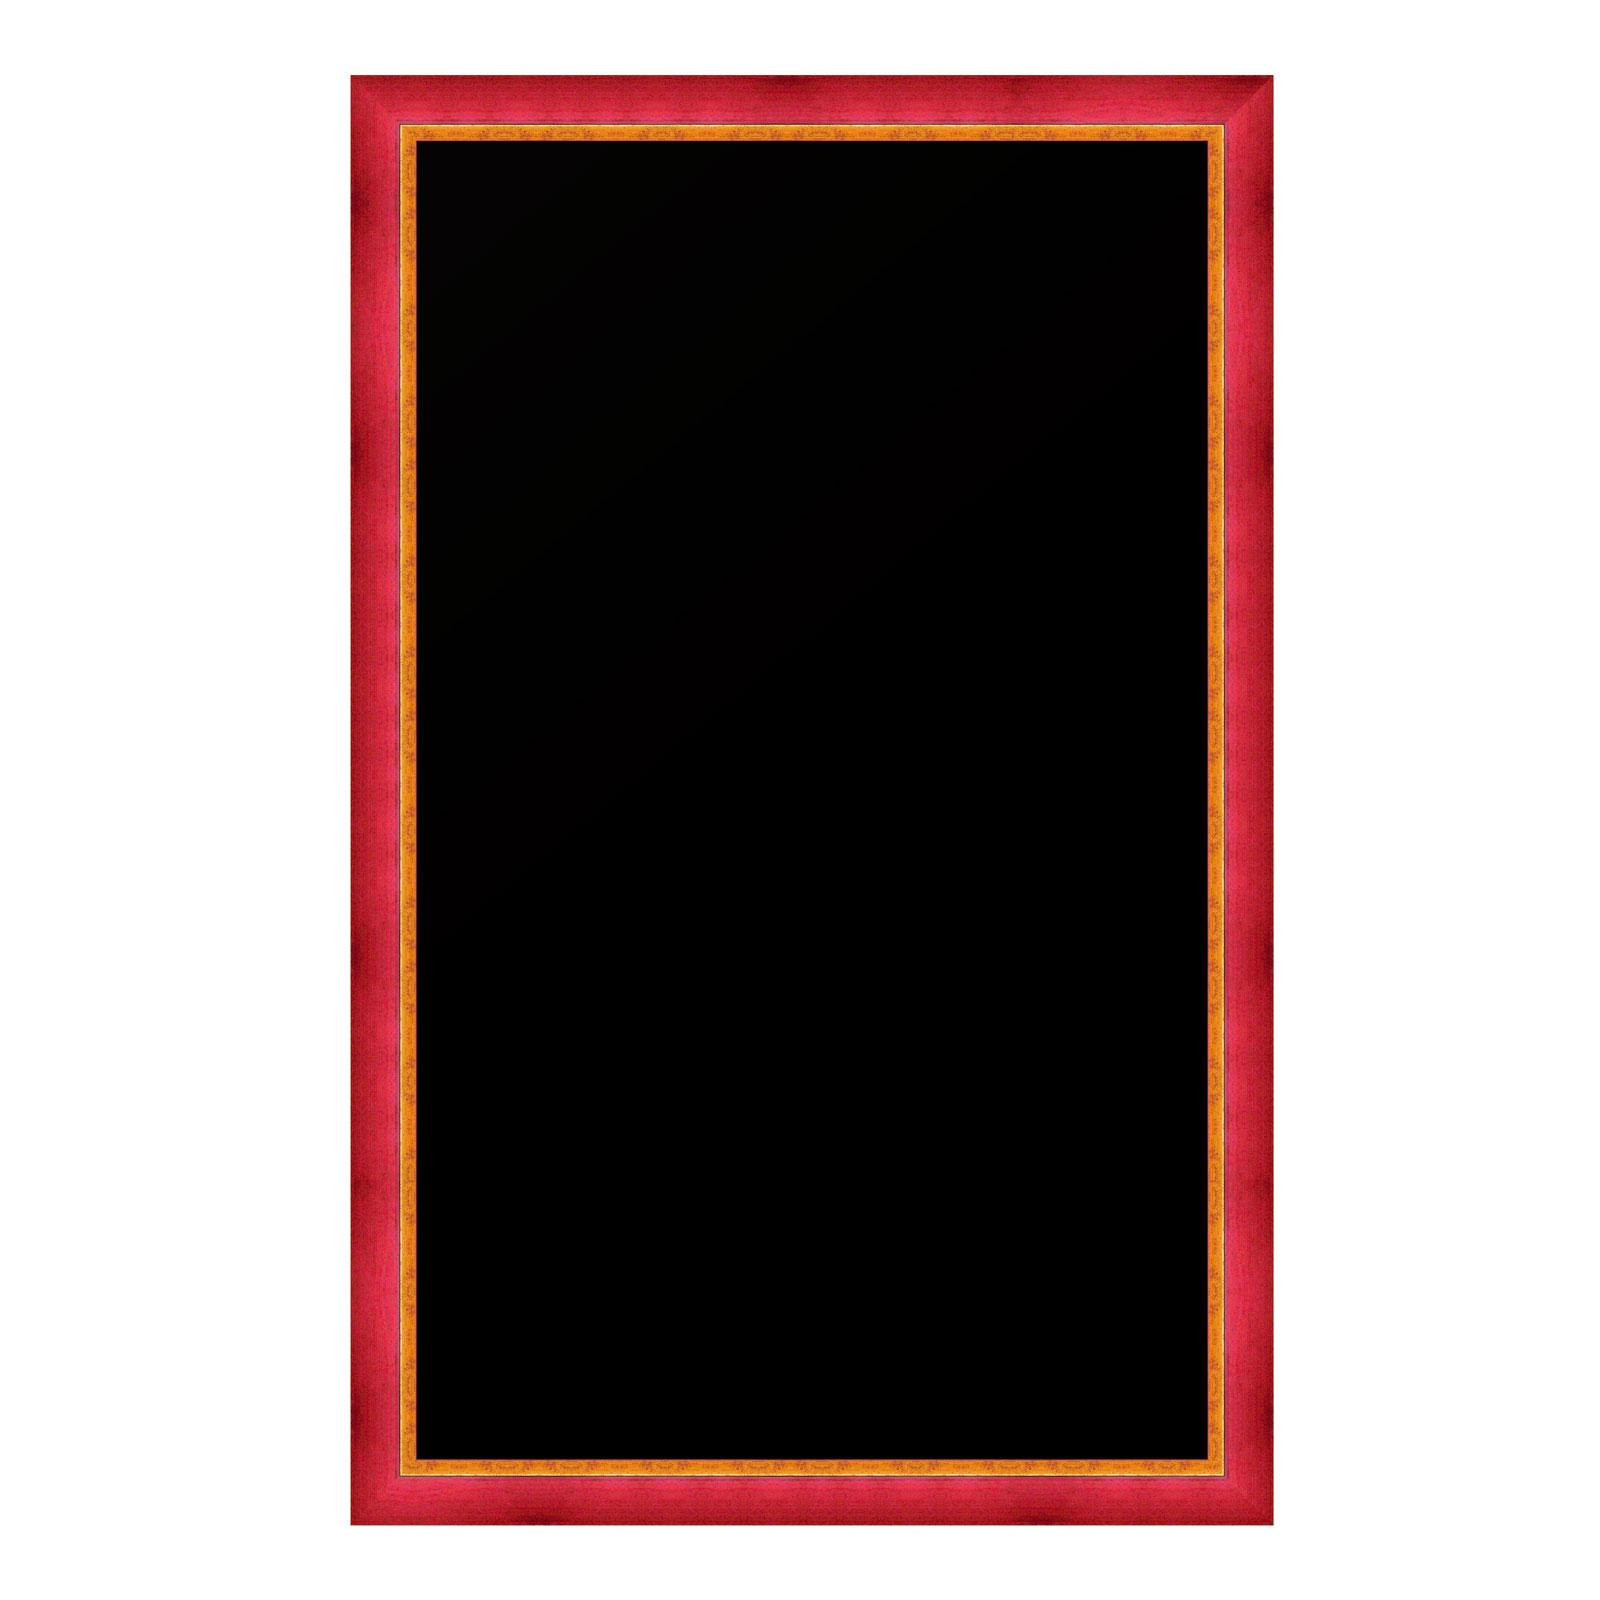 bienvenue sur porte. Black Bedroom Furniture Sets. Home Design Ideas